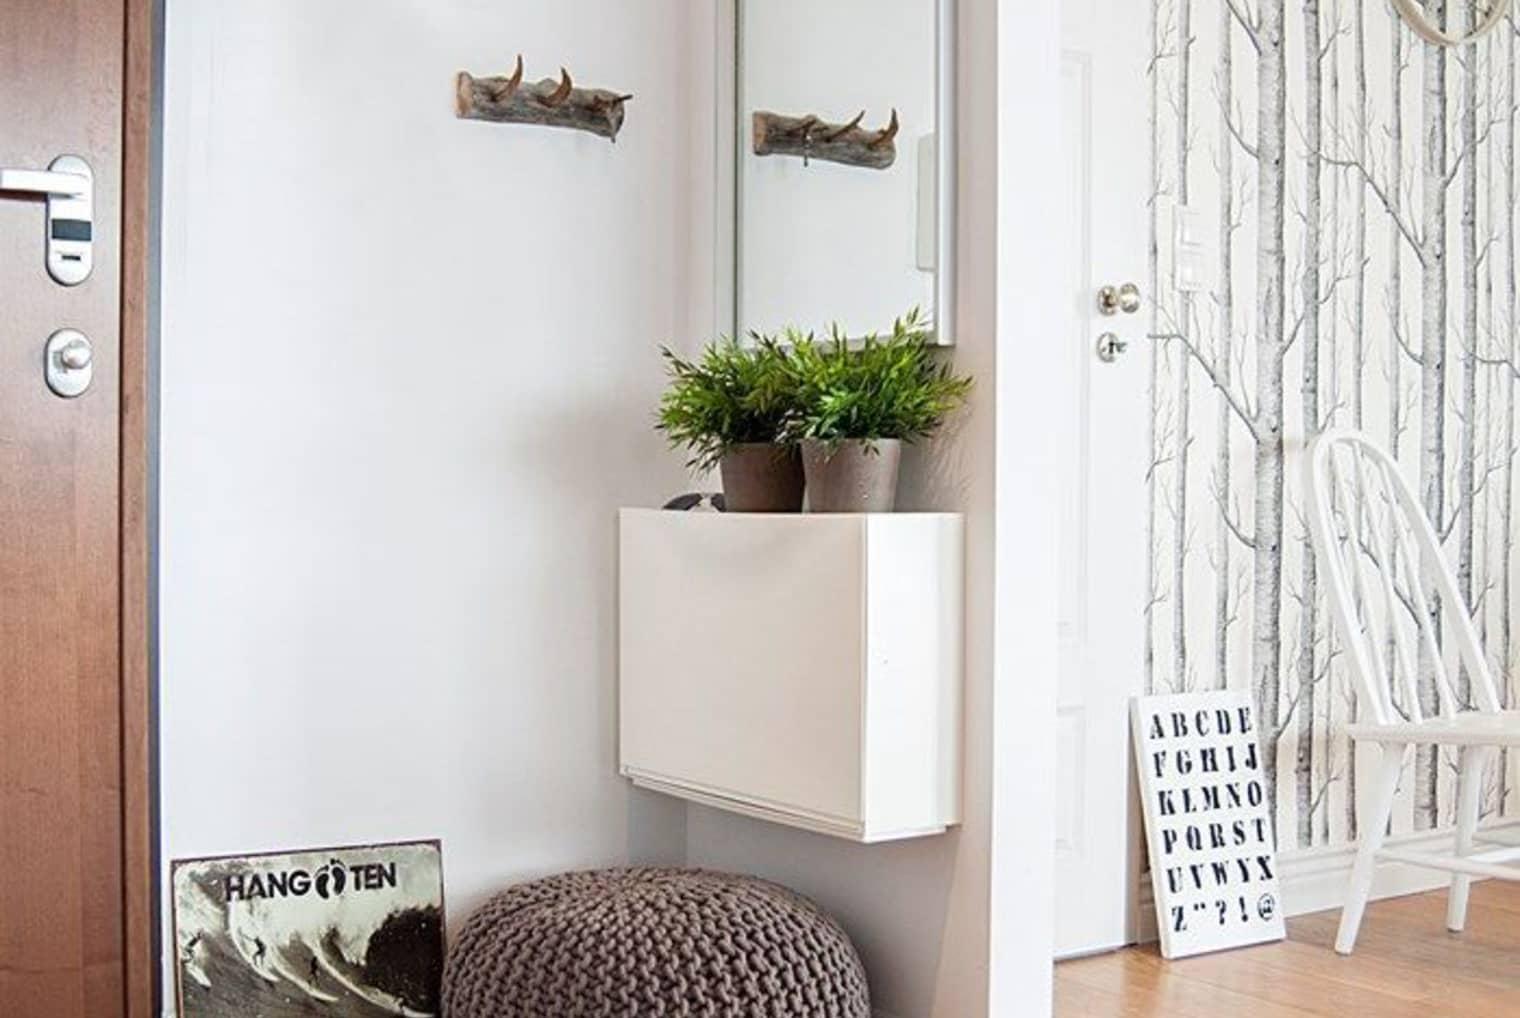 Hacks, DIYs and Creative Uses: The Most Popular IKEA Posts ...